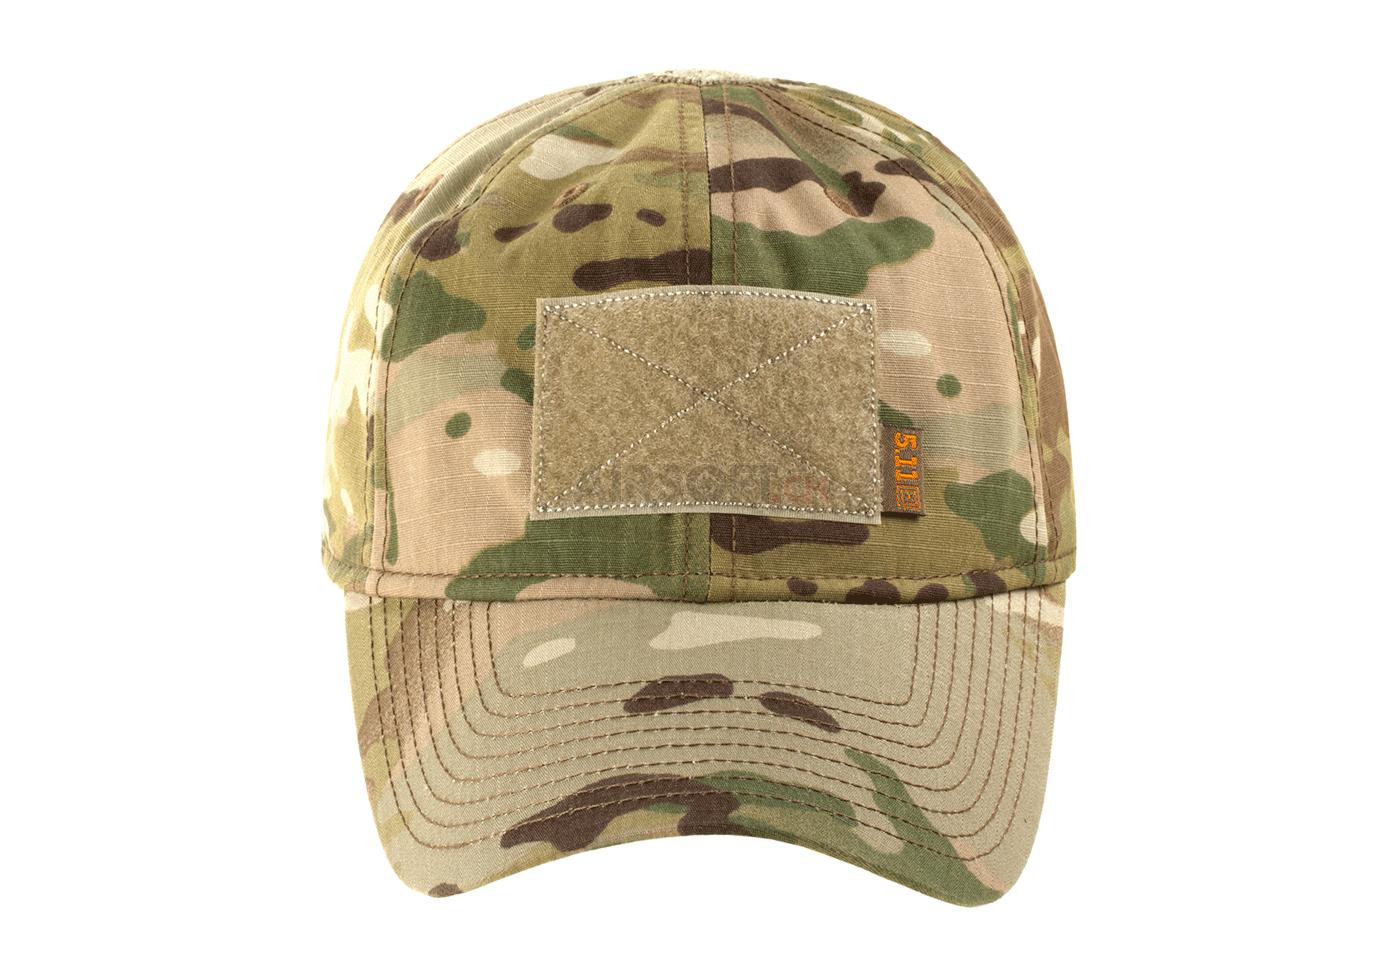 4322908fe8f26 Flag Bearer Cap Multicam (5.11 Tactical) - Caps - Kopfbedeckungen -  Bekleidung - airsoft.ch Onlineshop